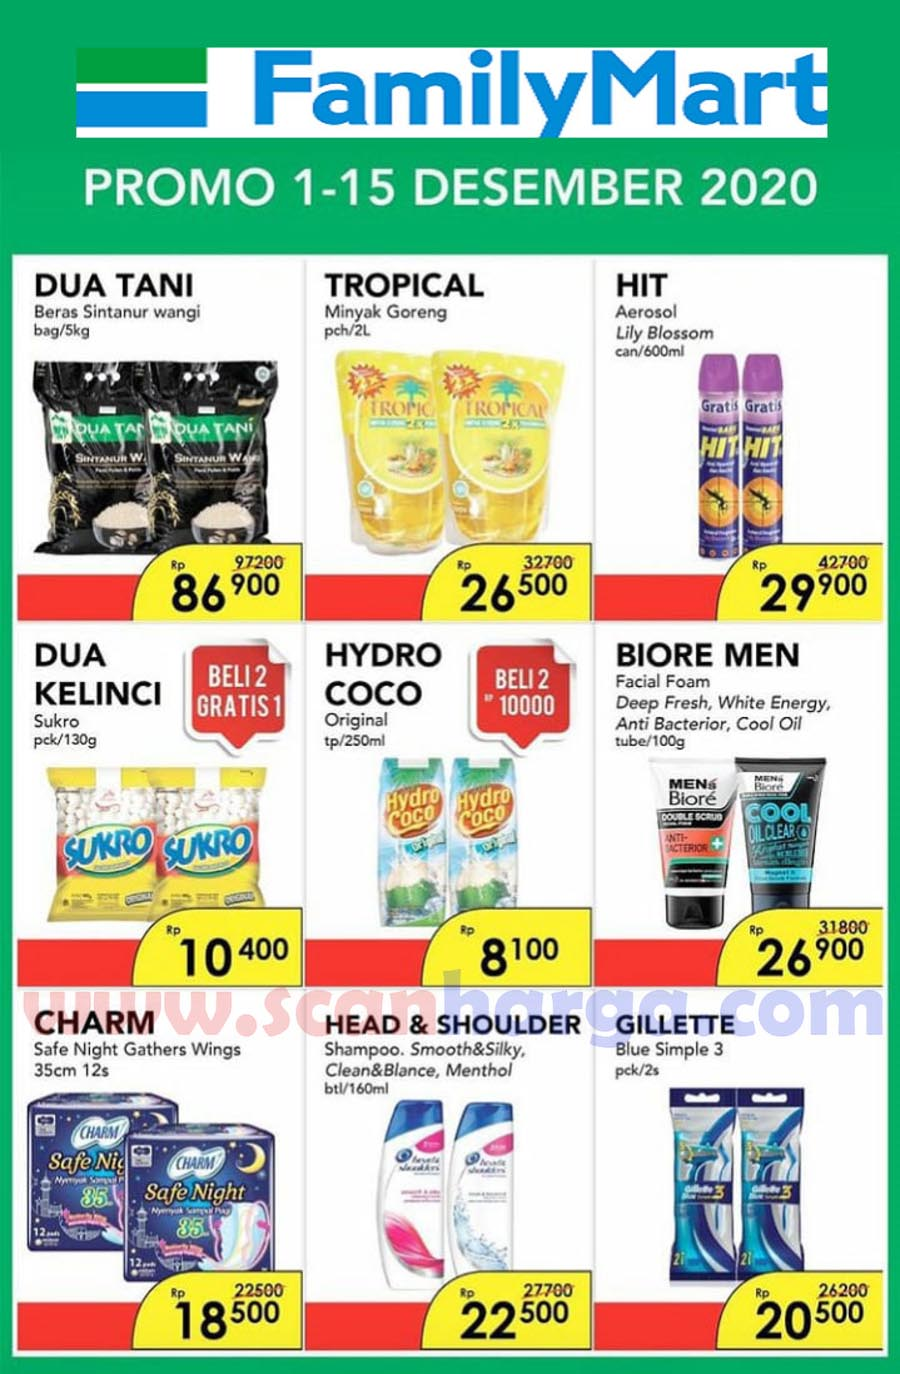 Katalog Promo Family Mart Periode 1 - 15 Desember 2020 1